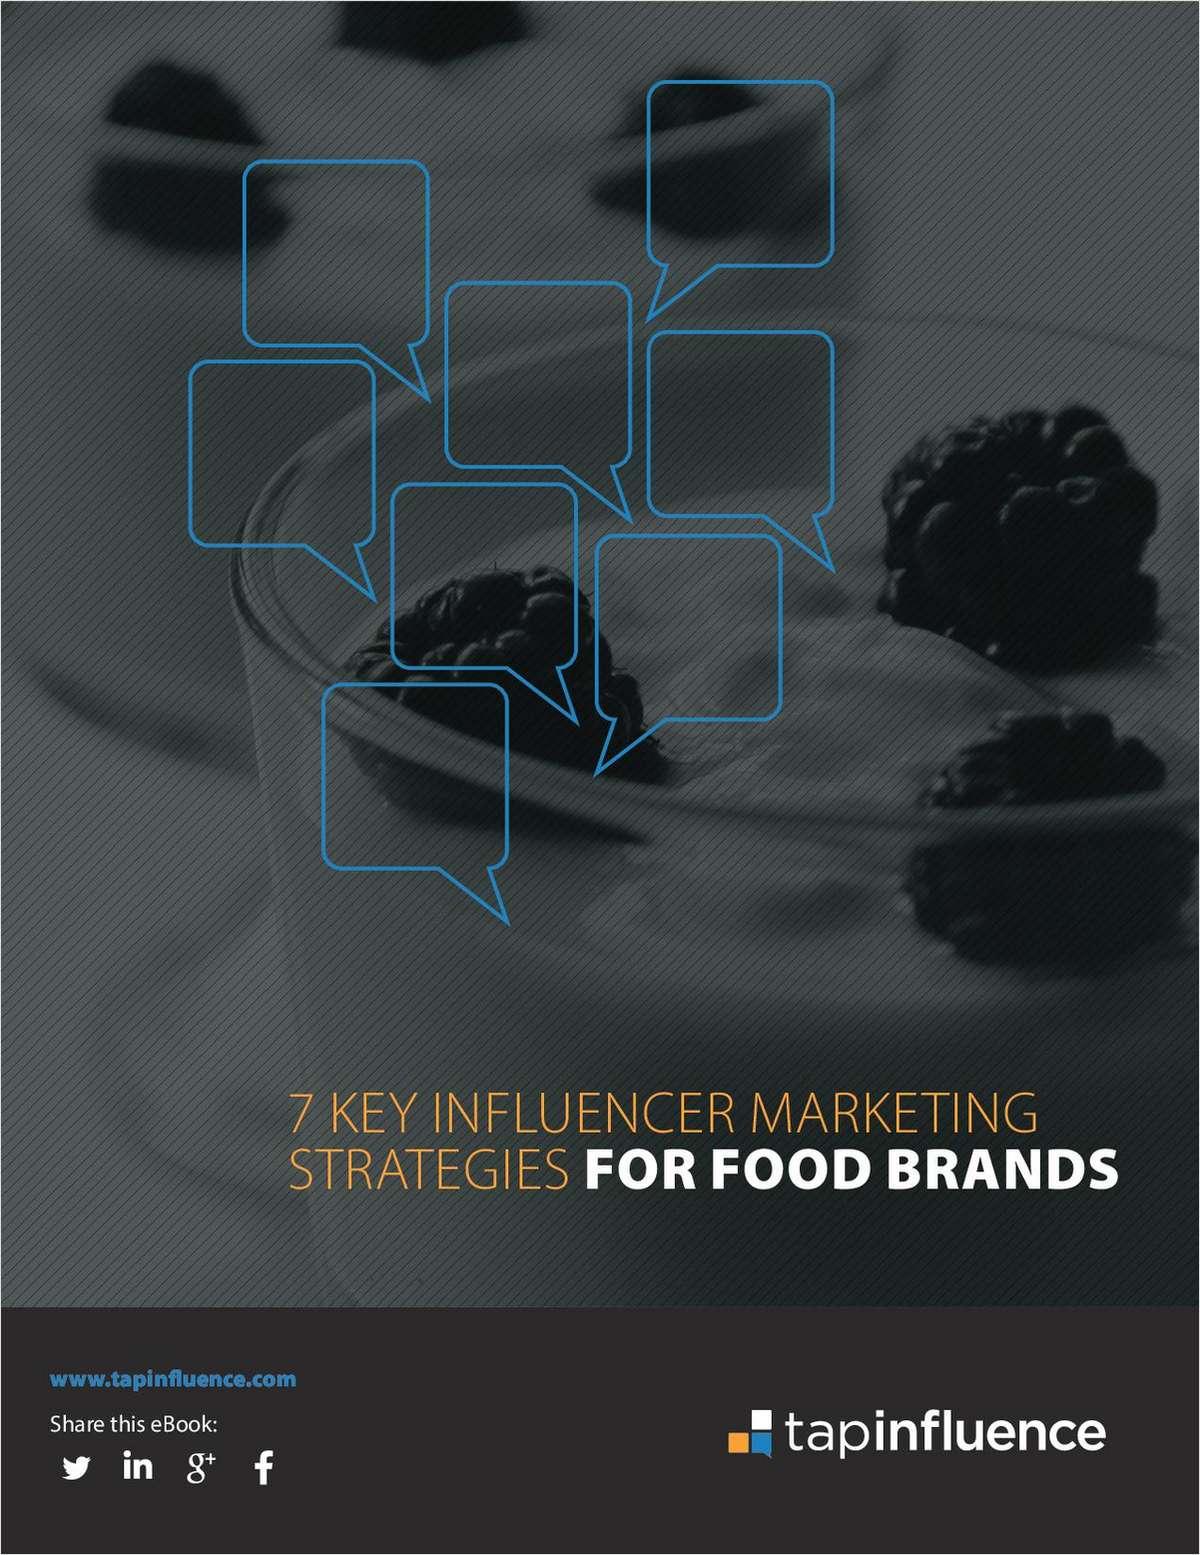 7 Key Influencer Marketing Strategies for Food Brands